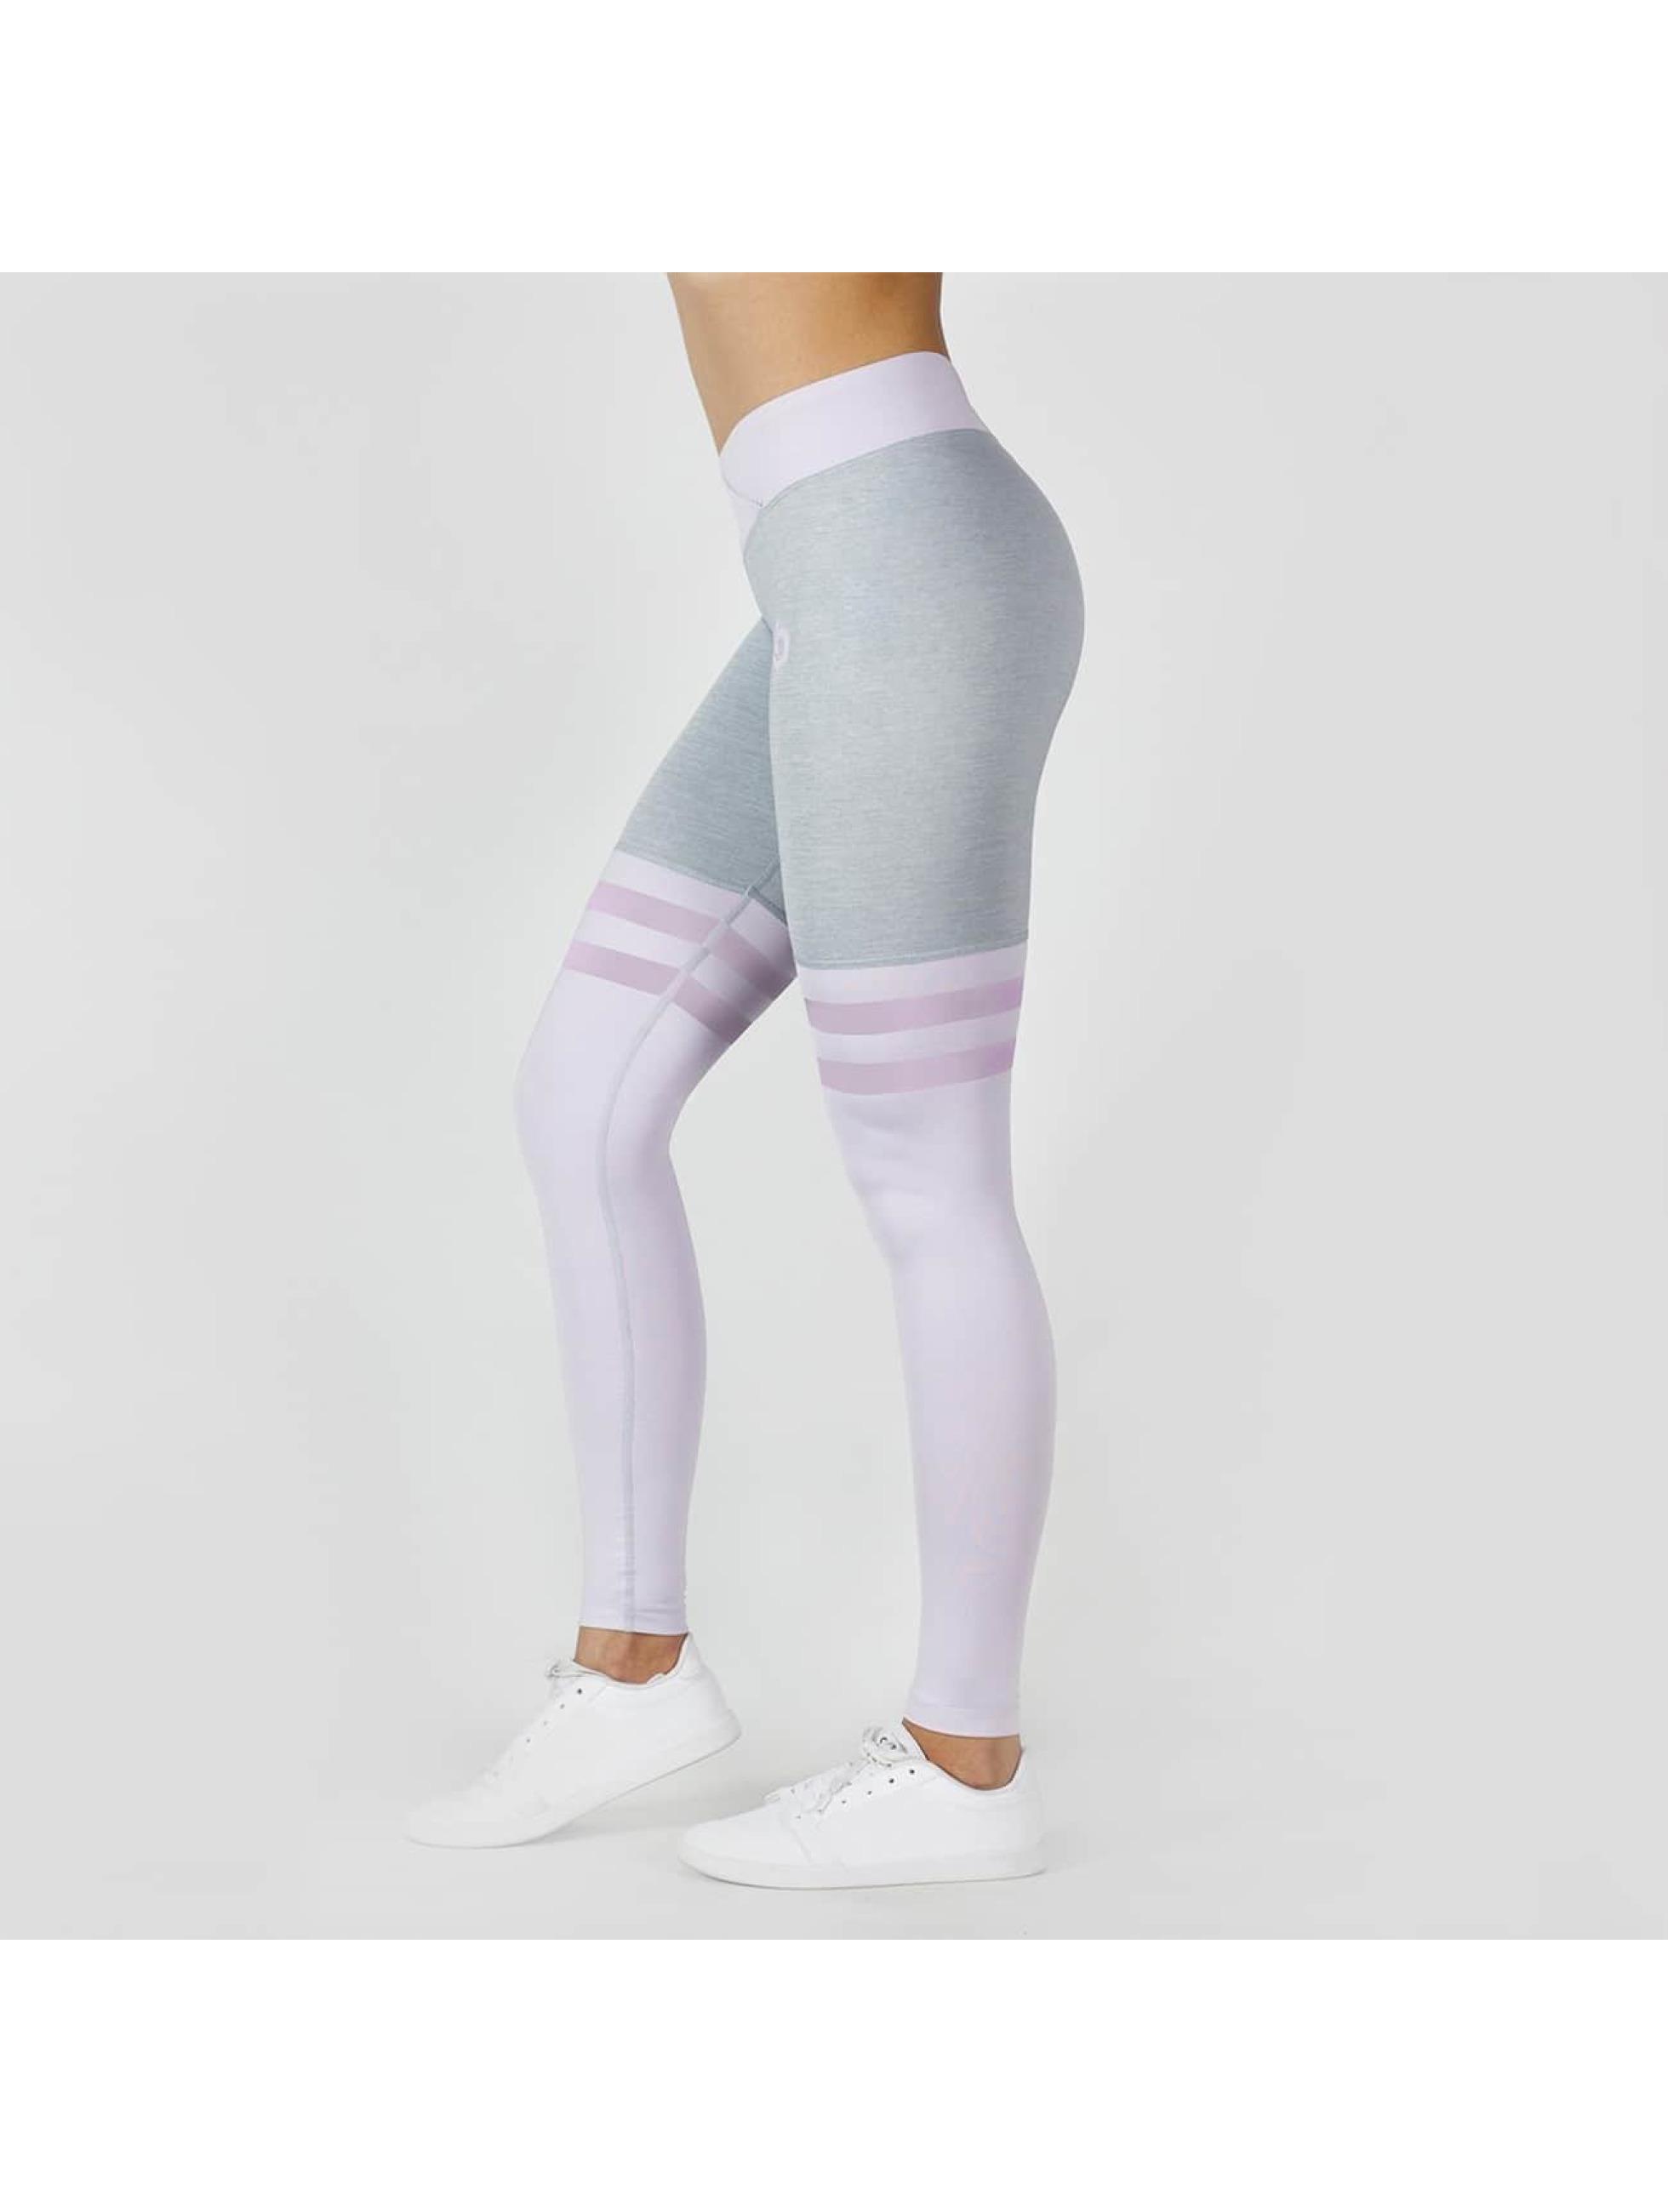 Beyond Limits Legging/Tregging Overknee gris